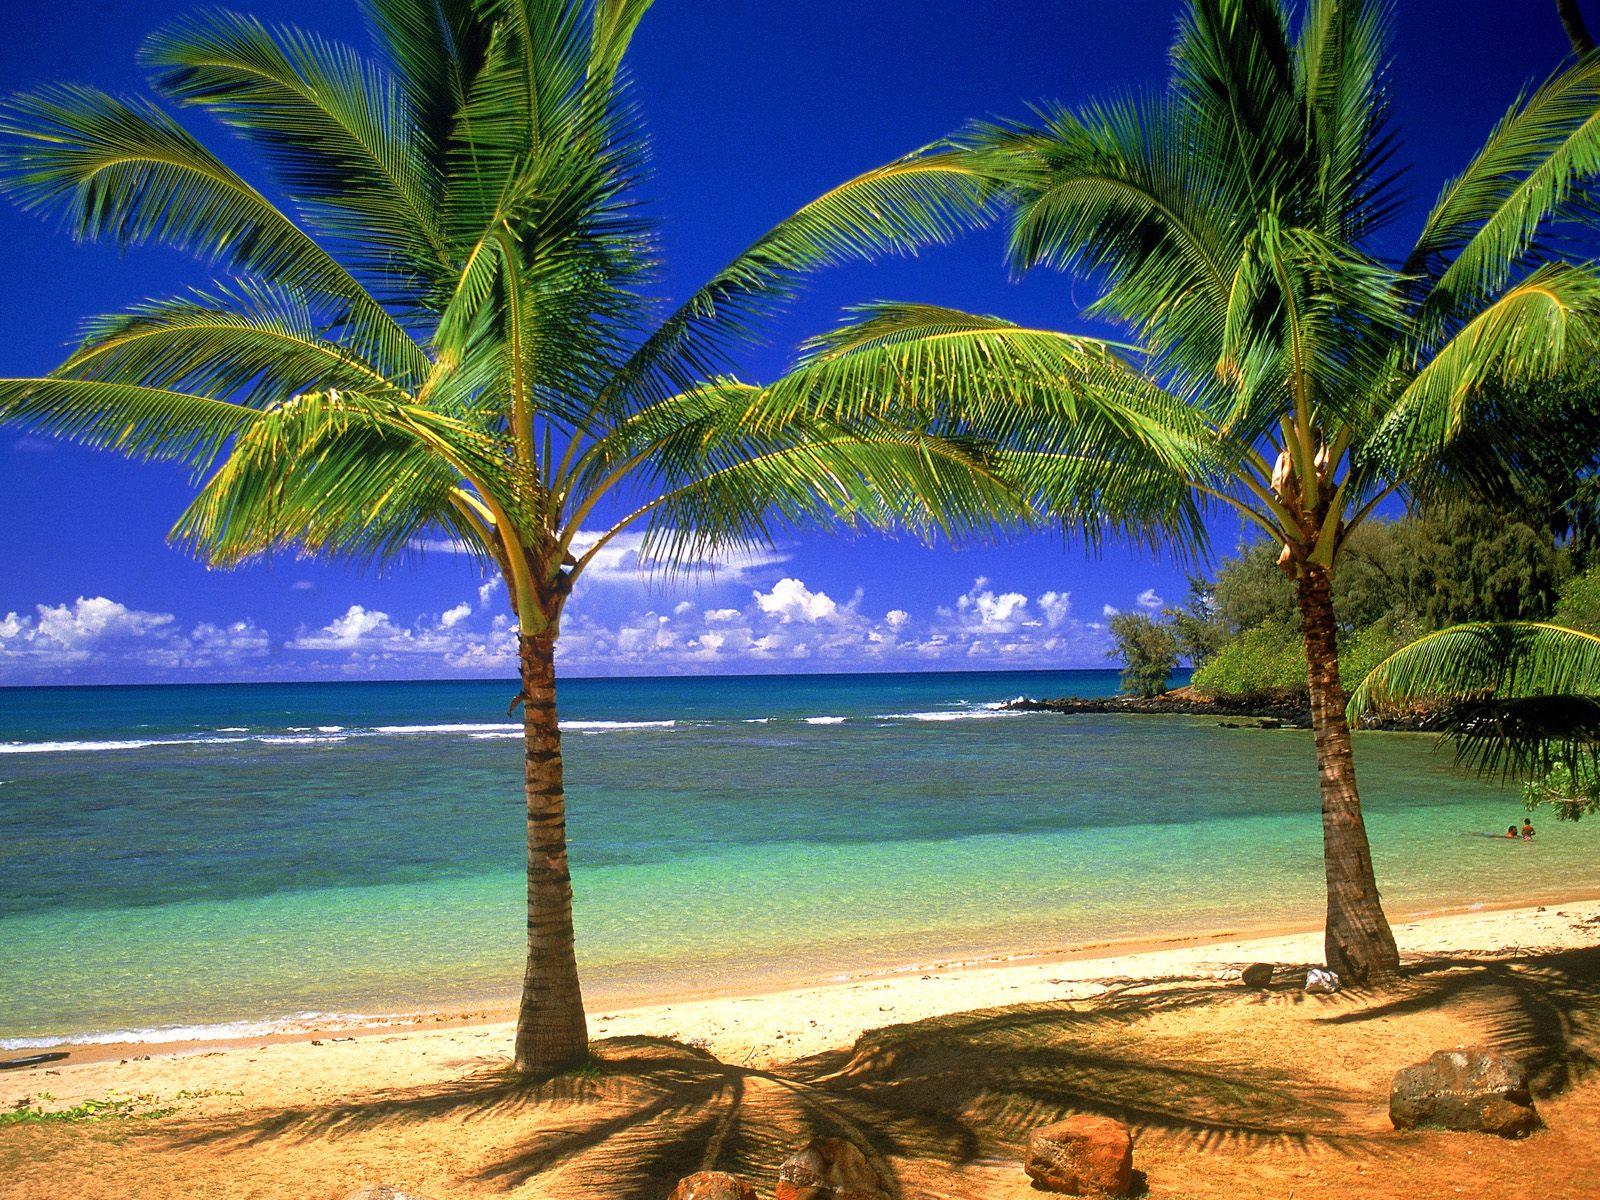 Tropical Lagoon Canada Photography Desktop Wallpapers 6505 Views